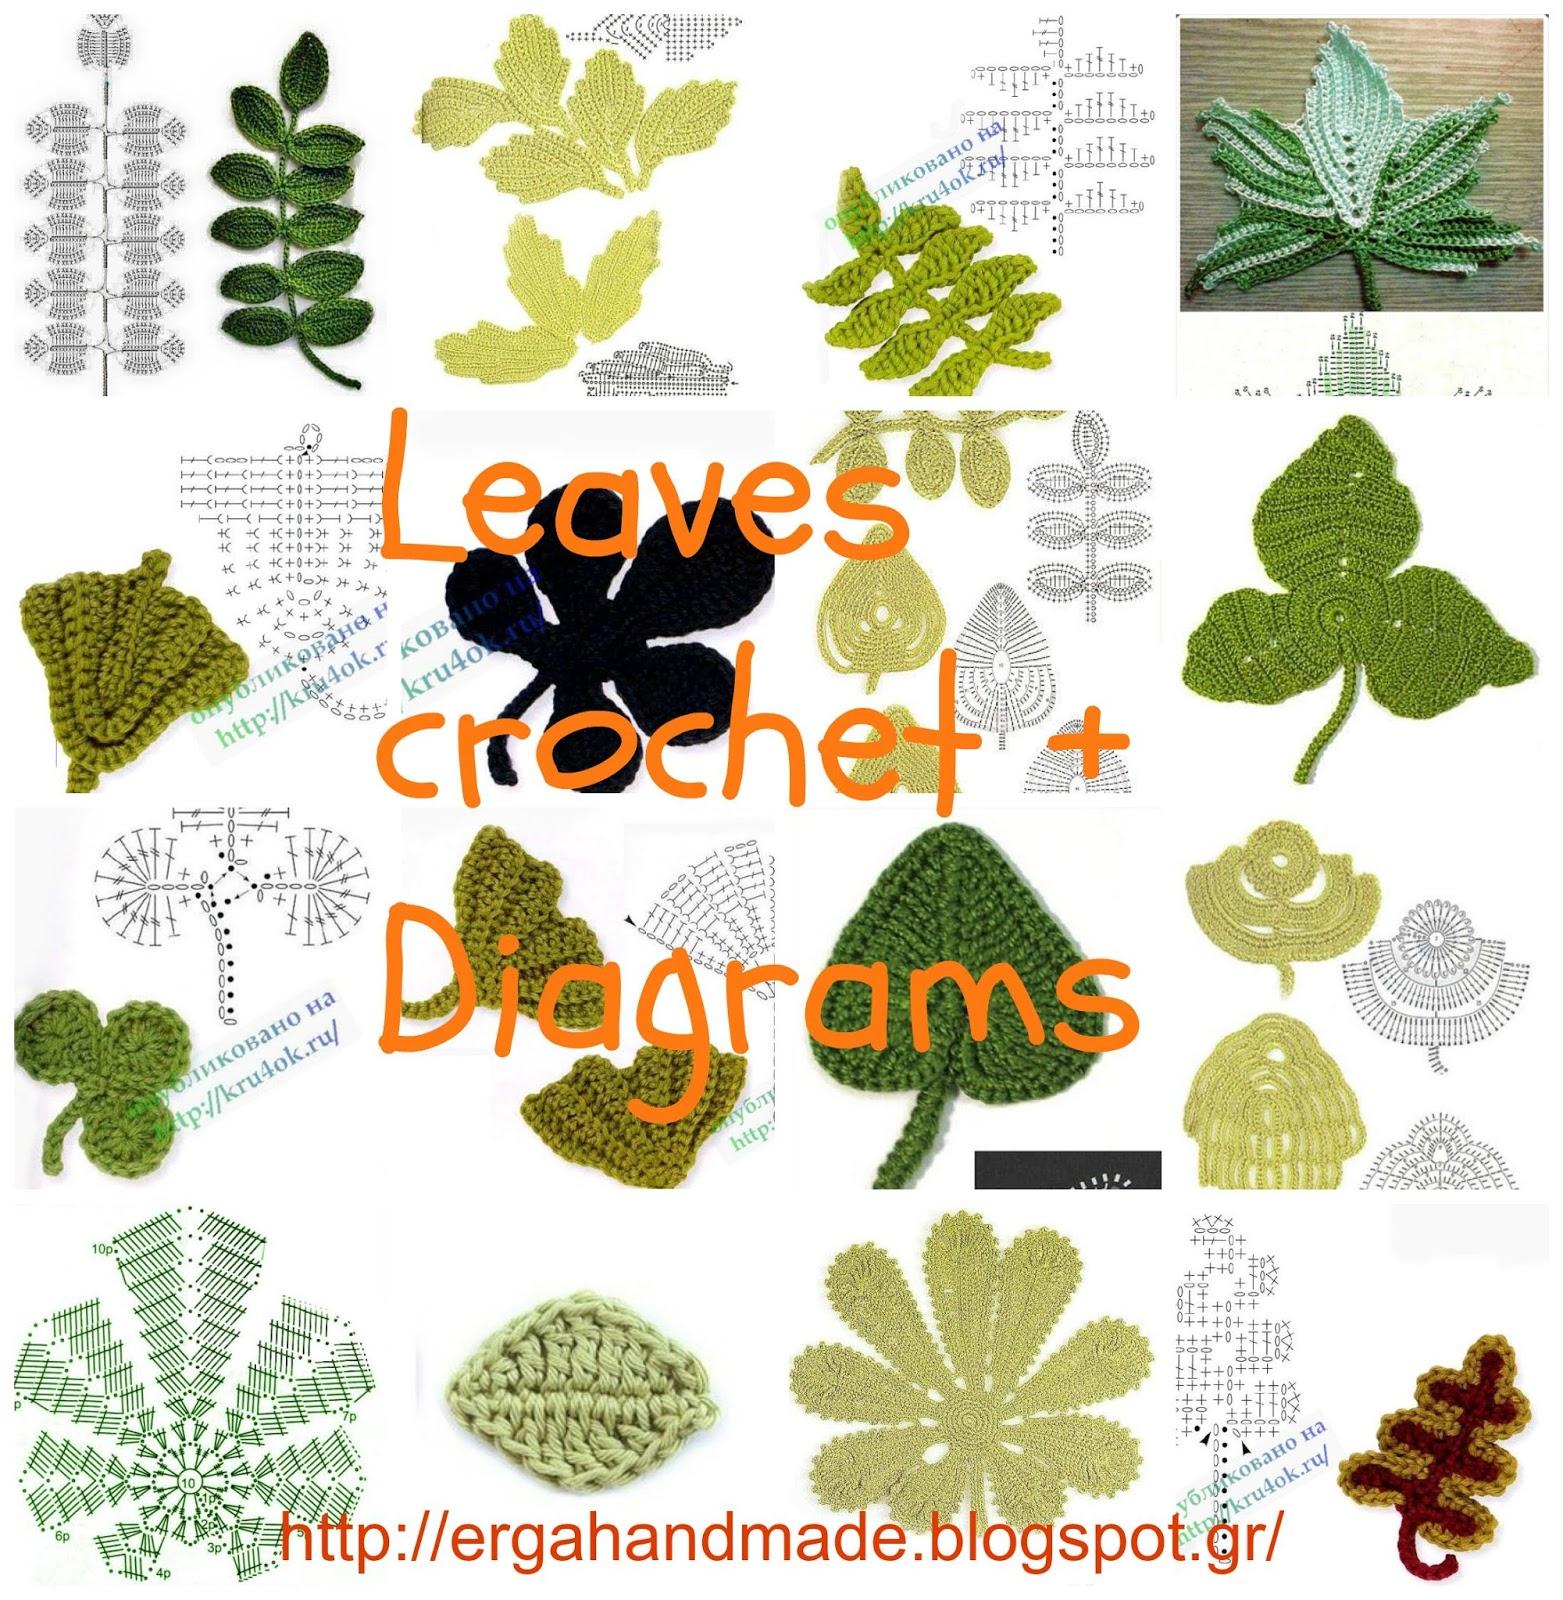 Free Leaf Crochet Pattern Diagram Molecular Orbital Energy Level For No Ergahandmade Leaves 43 Diagrams Video